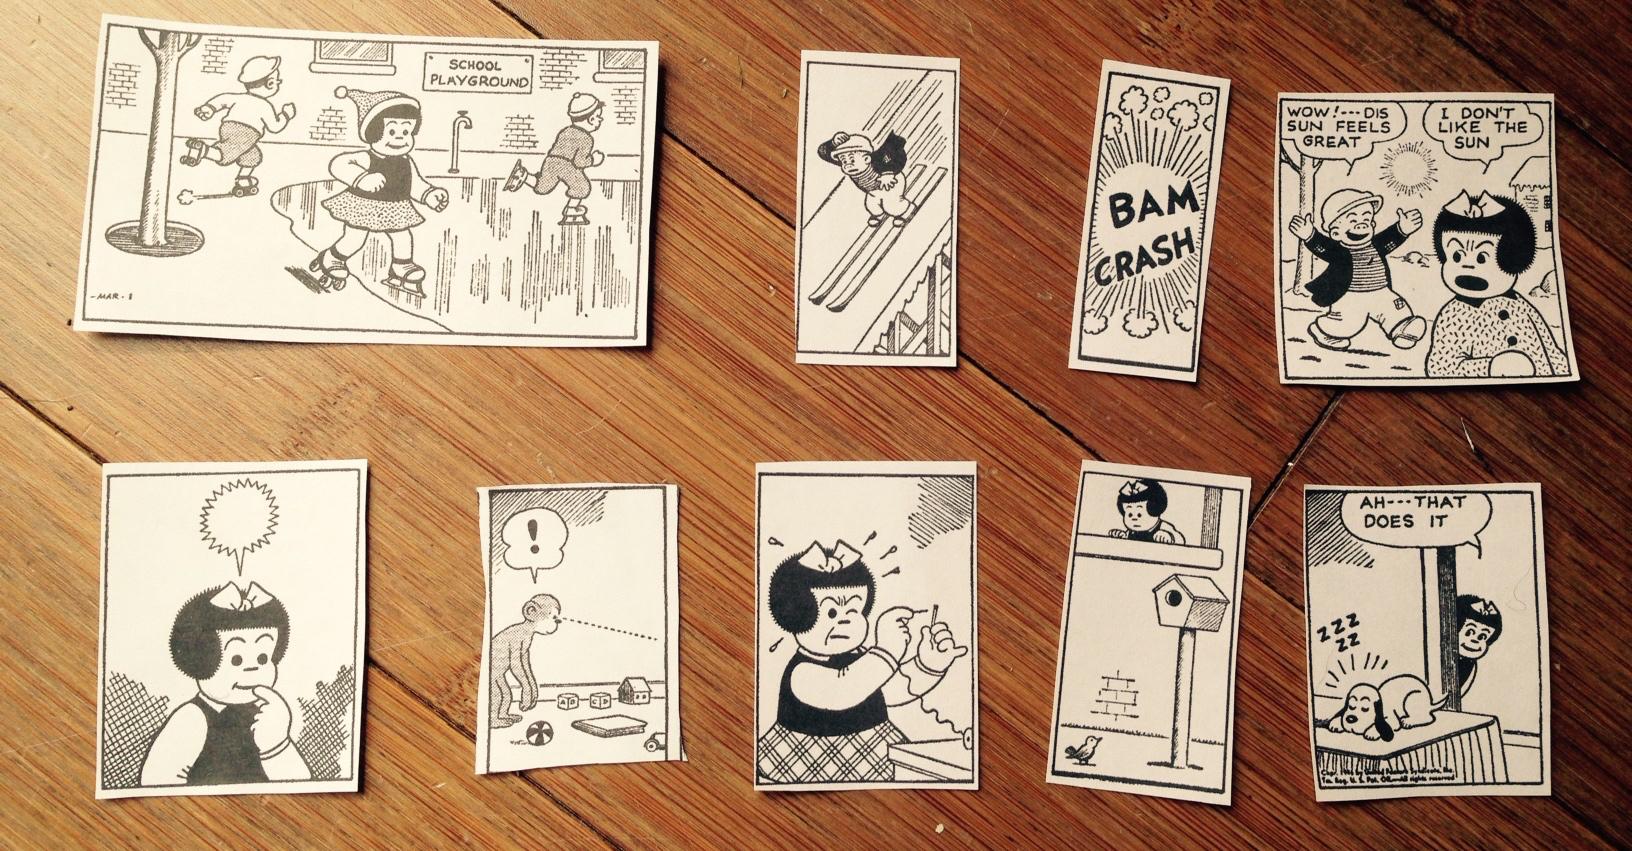 Comic strip by ernie bushmiller